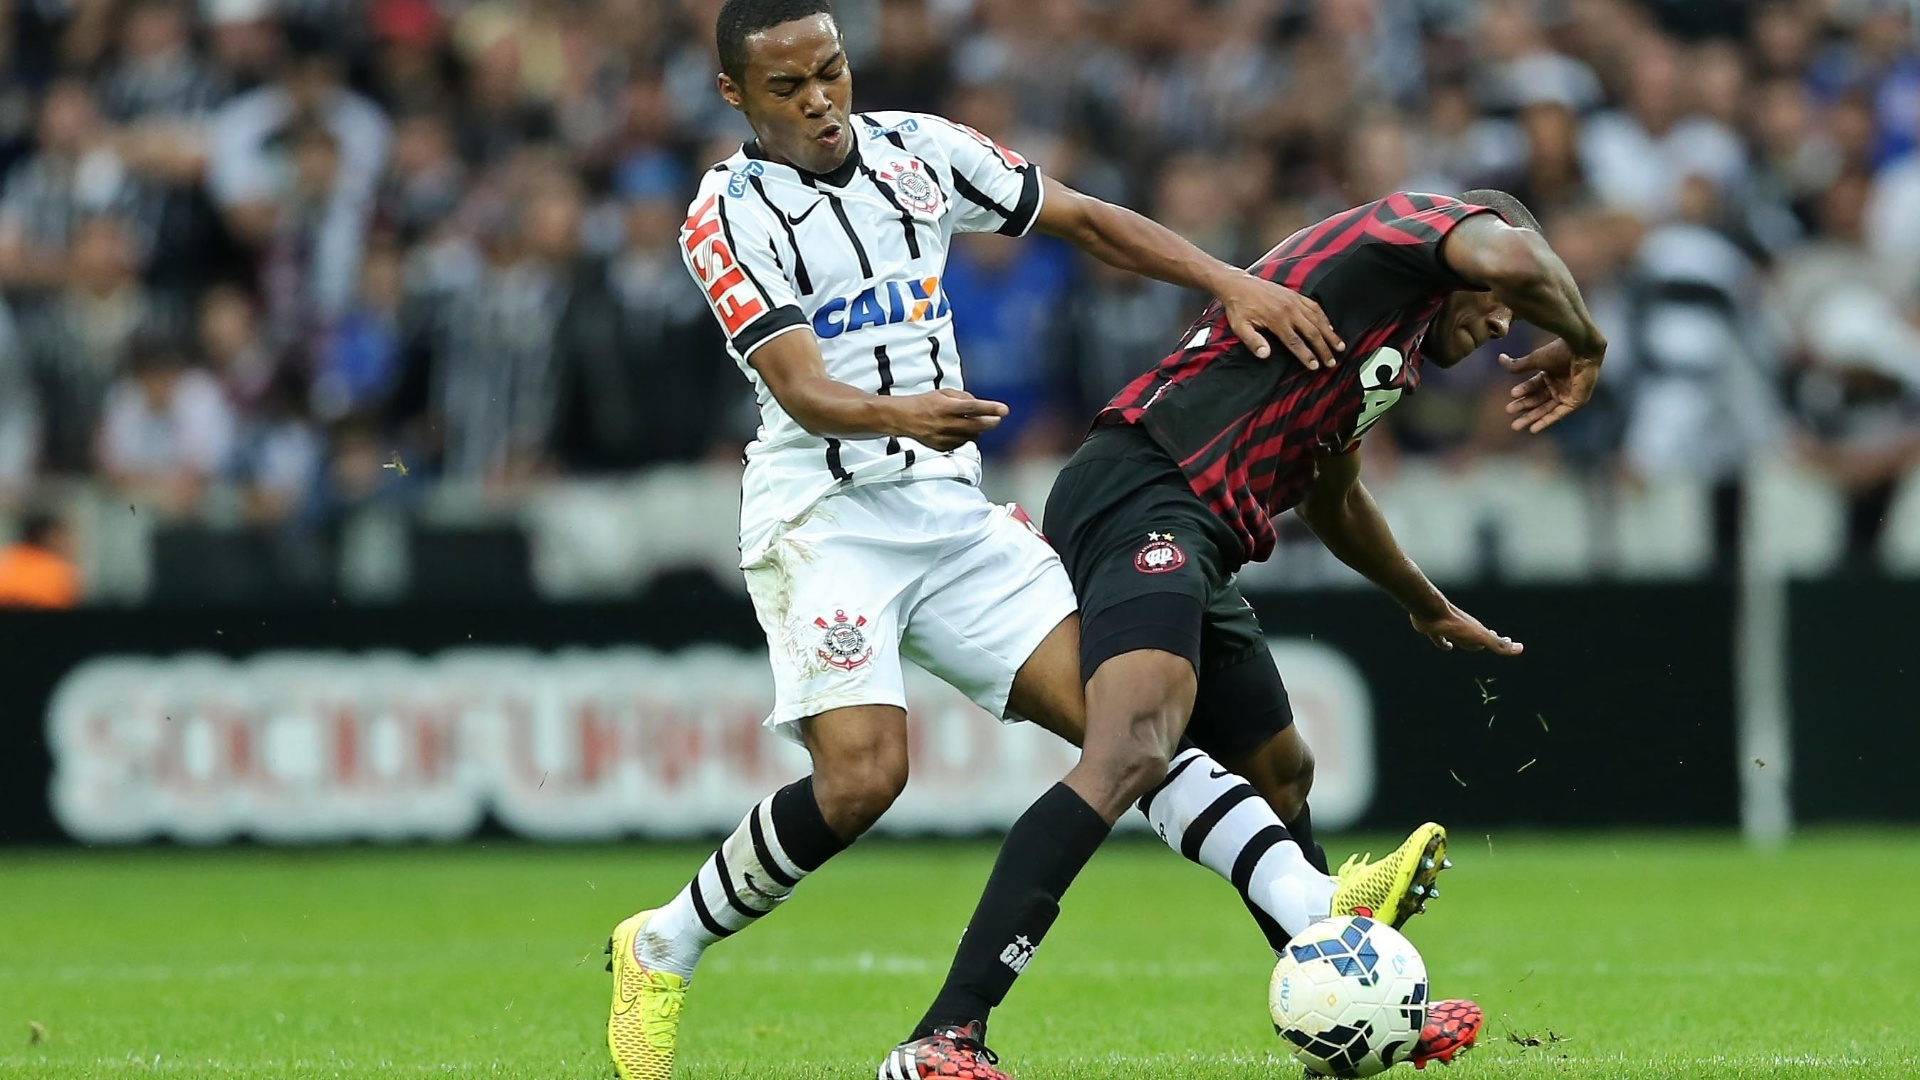 Elias tenta roubar a bola de Marcelo durante jogo entre Corinthians e Atlético-PR